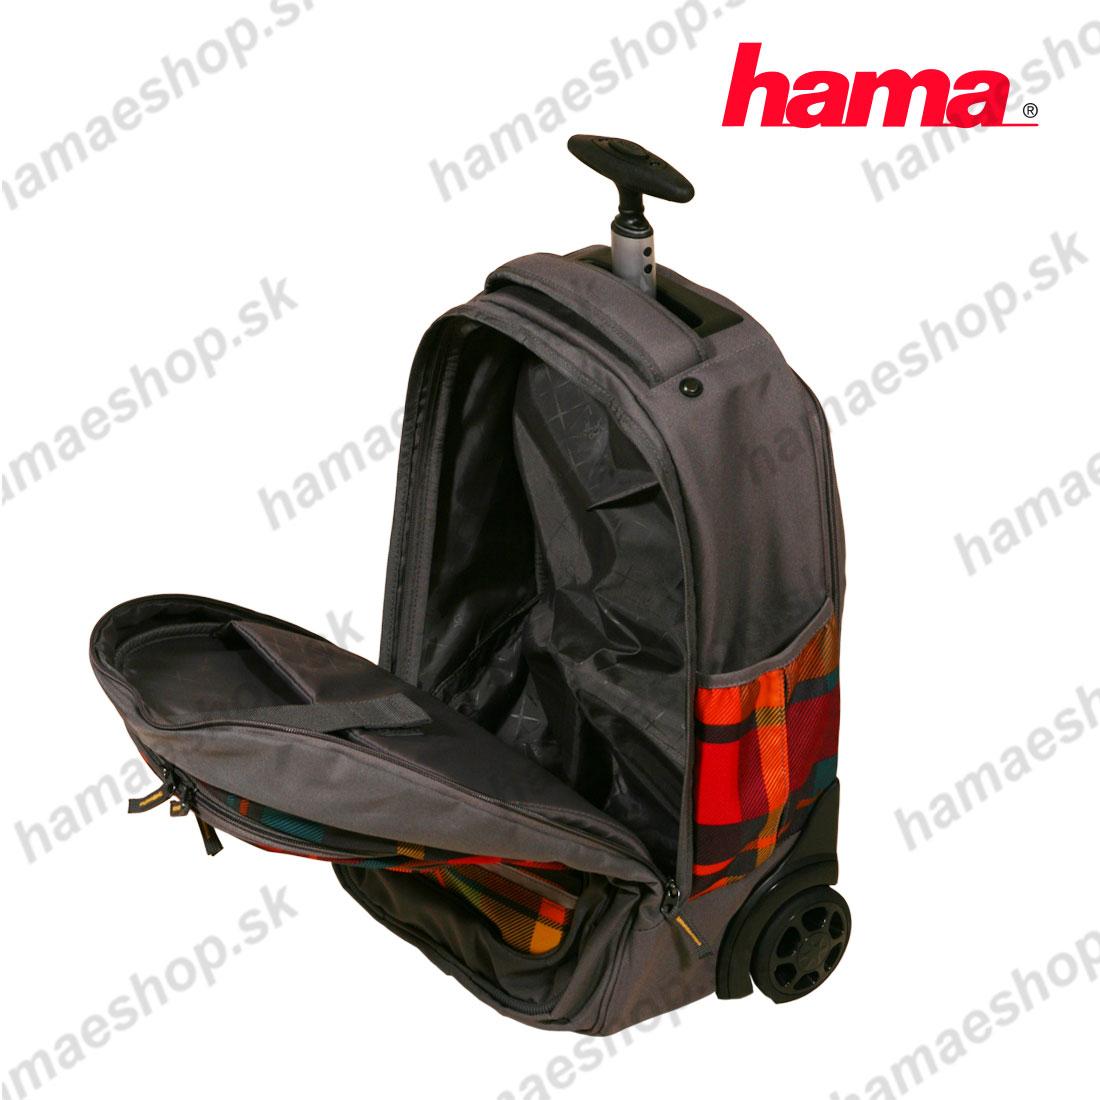 54da59399d552 Školská taška na kolieskach | HamaEshop.sk